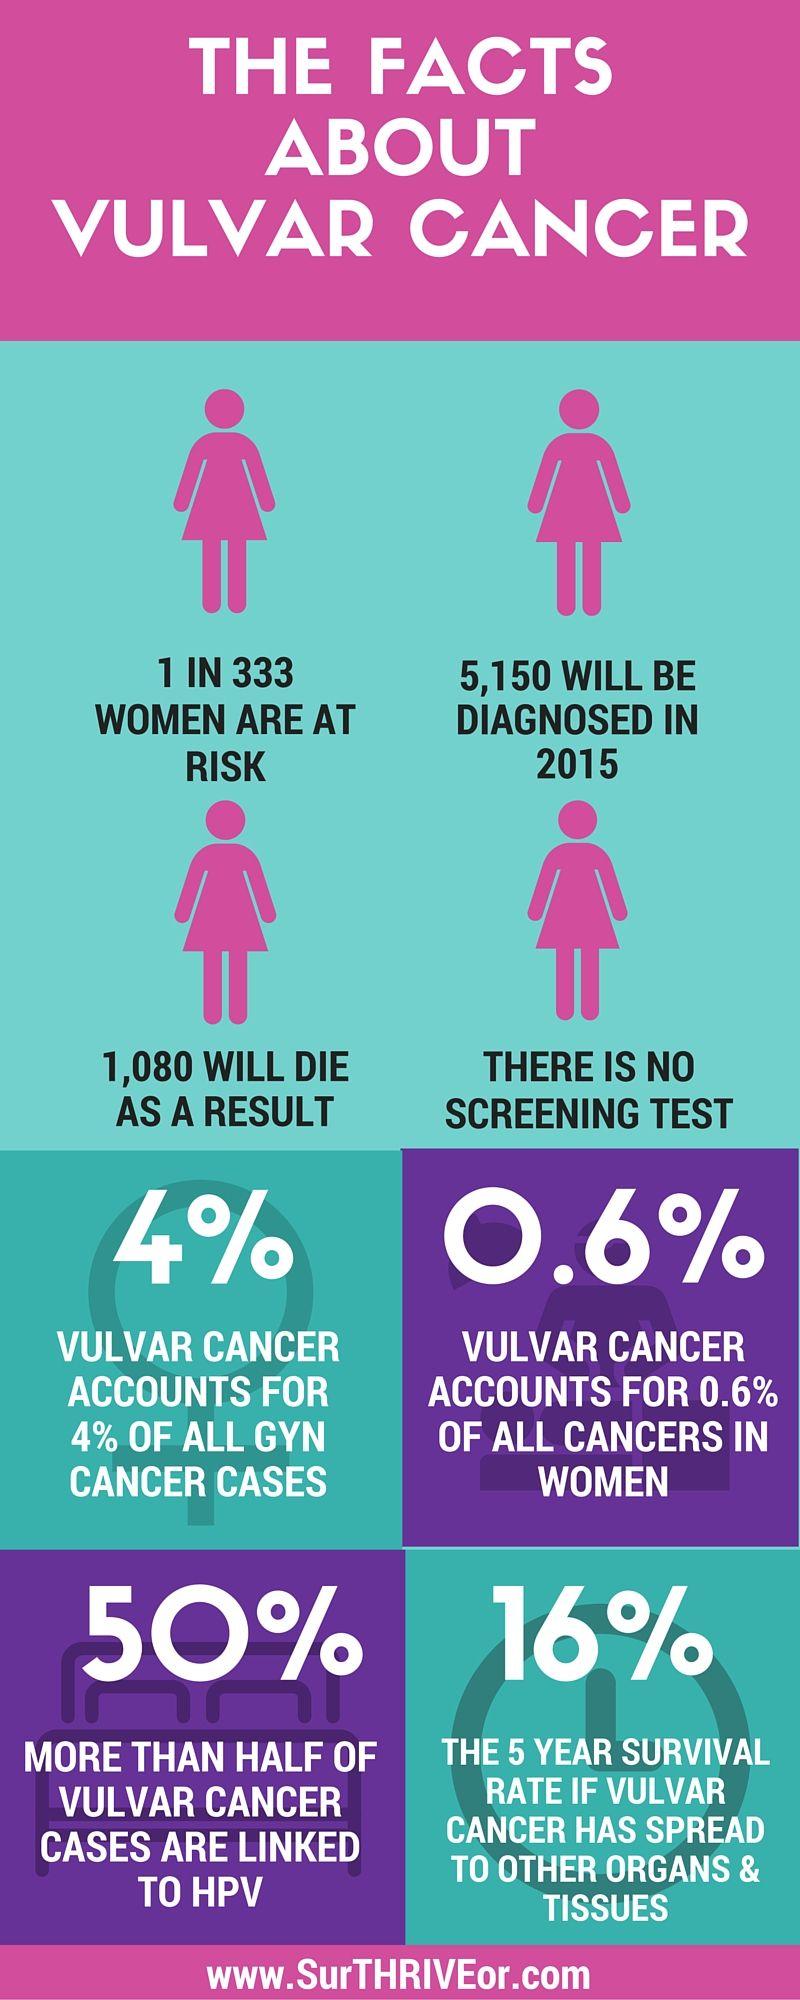 Vulvar Cancer #SurTHRIVEor | #SurTHRIVEor | Pinterest  Vulvar Cancer